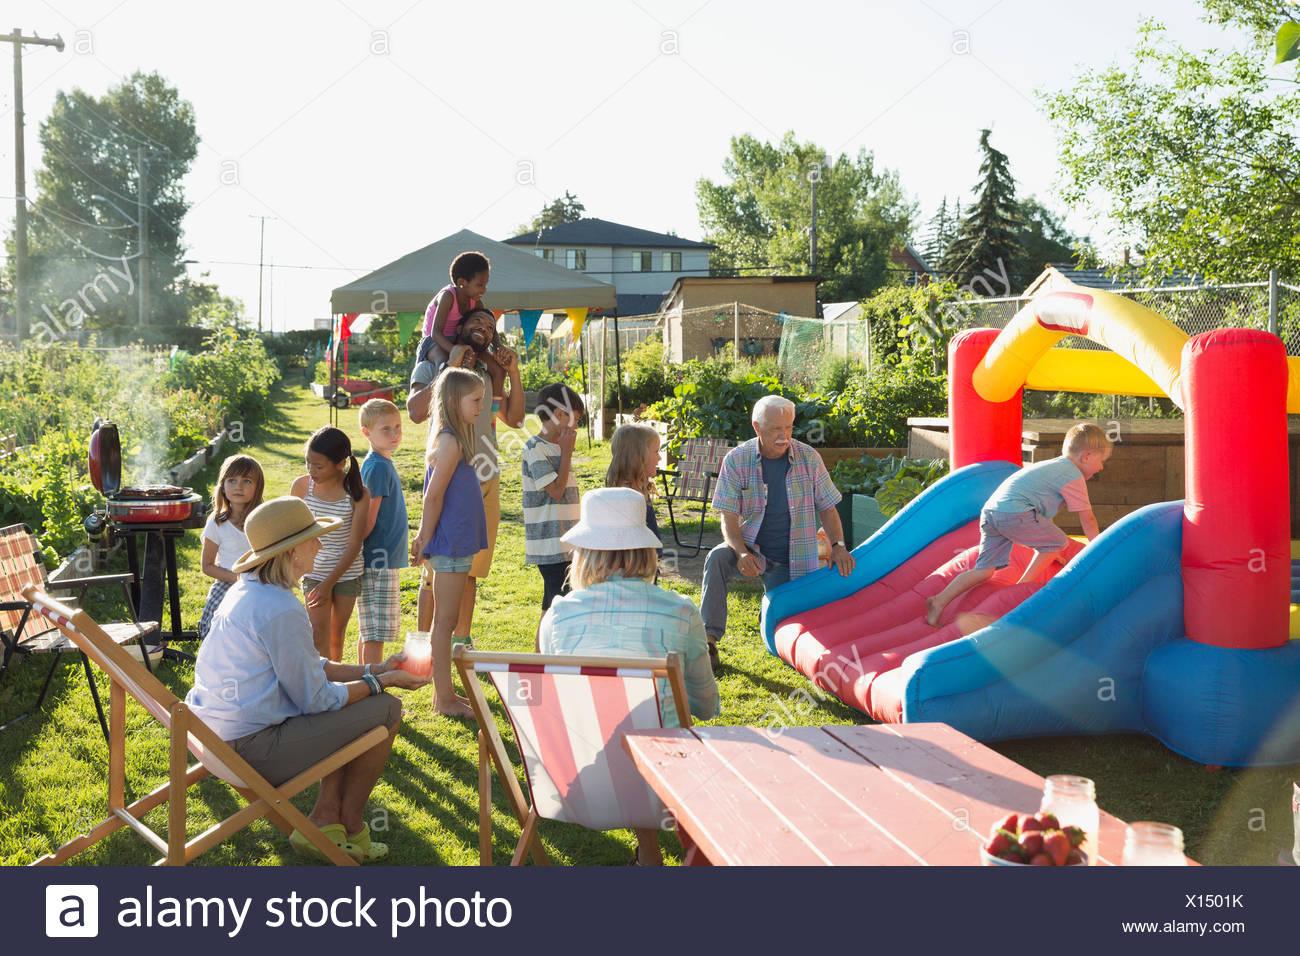 Kids Play Stockfotos & Kids Play Bilder - Alamy